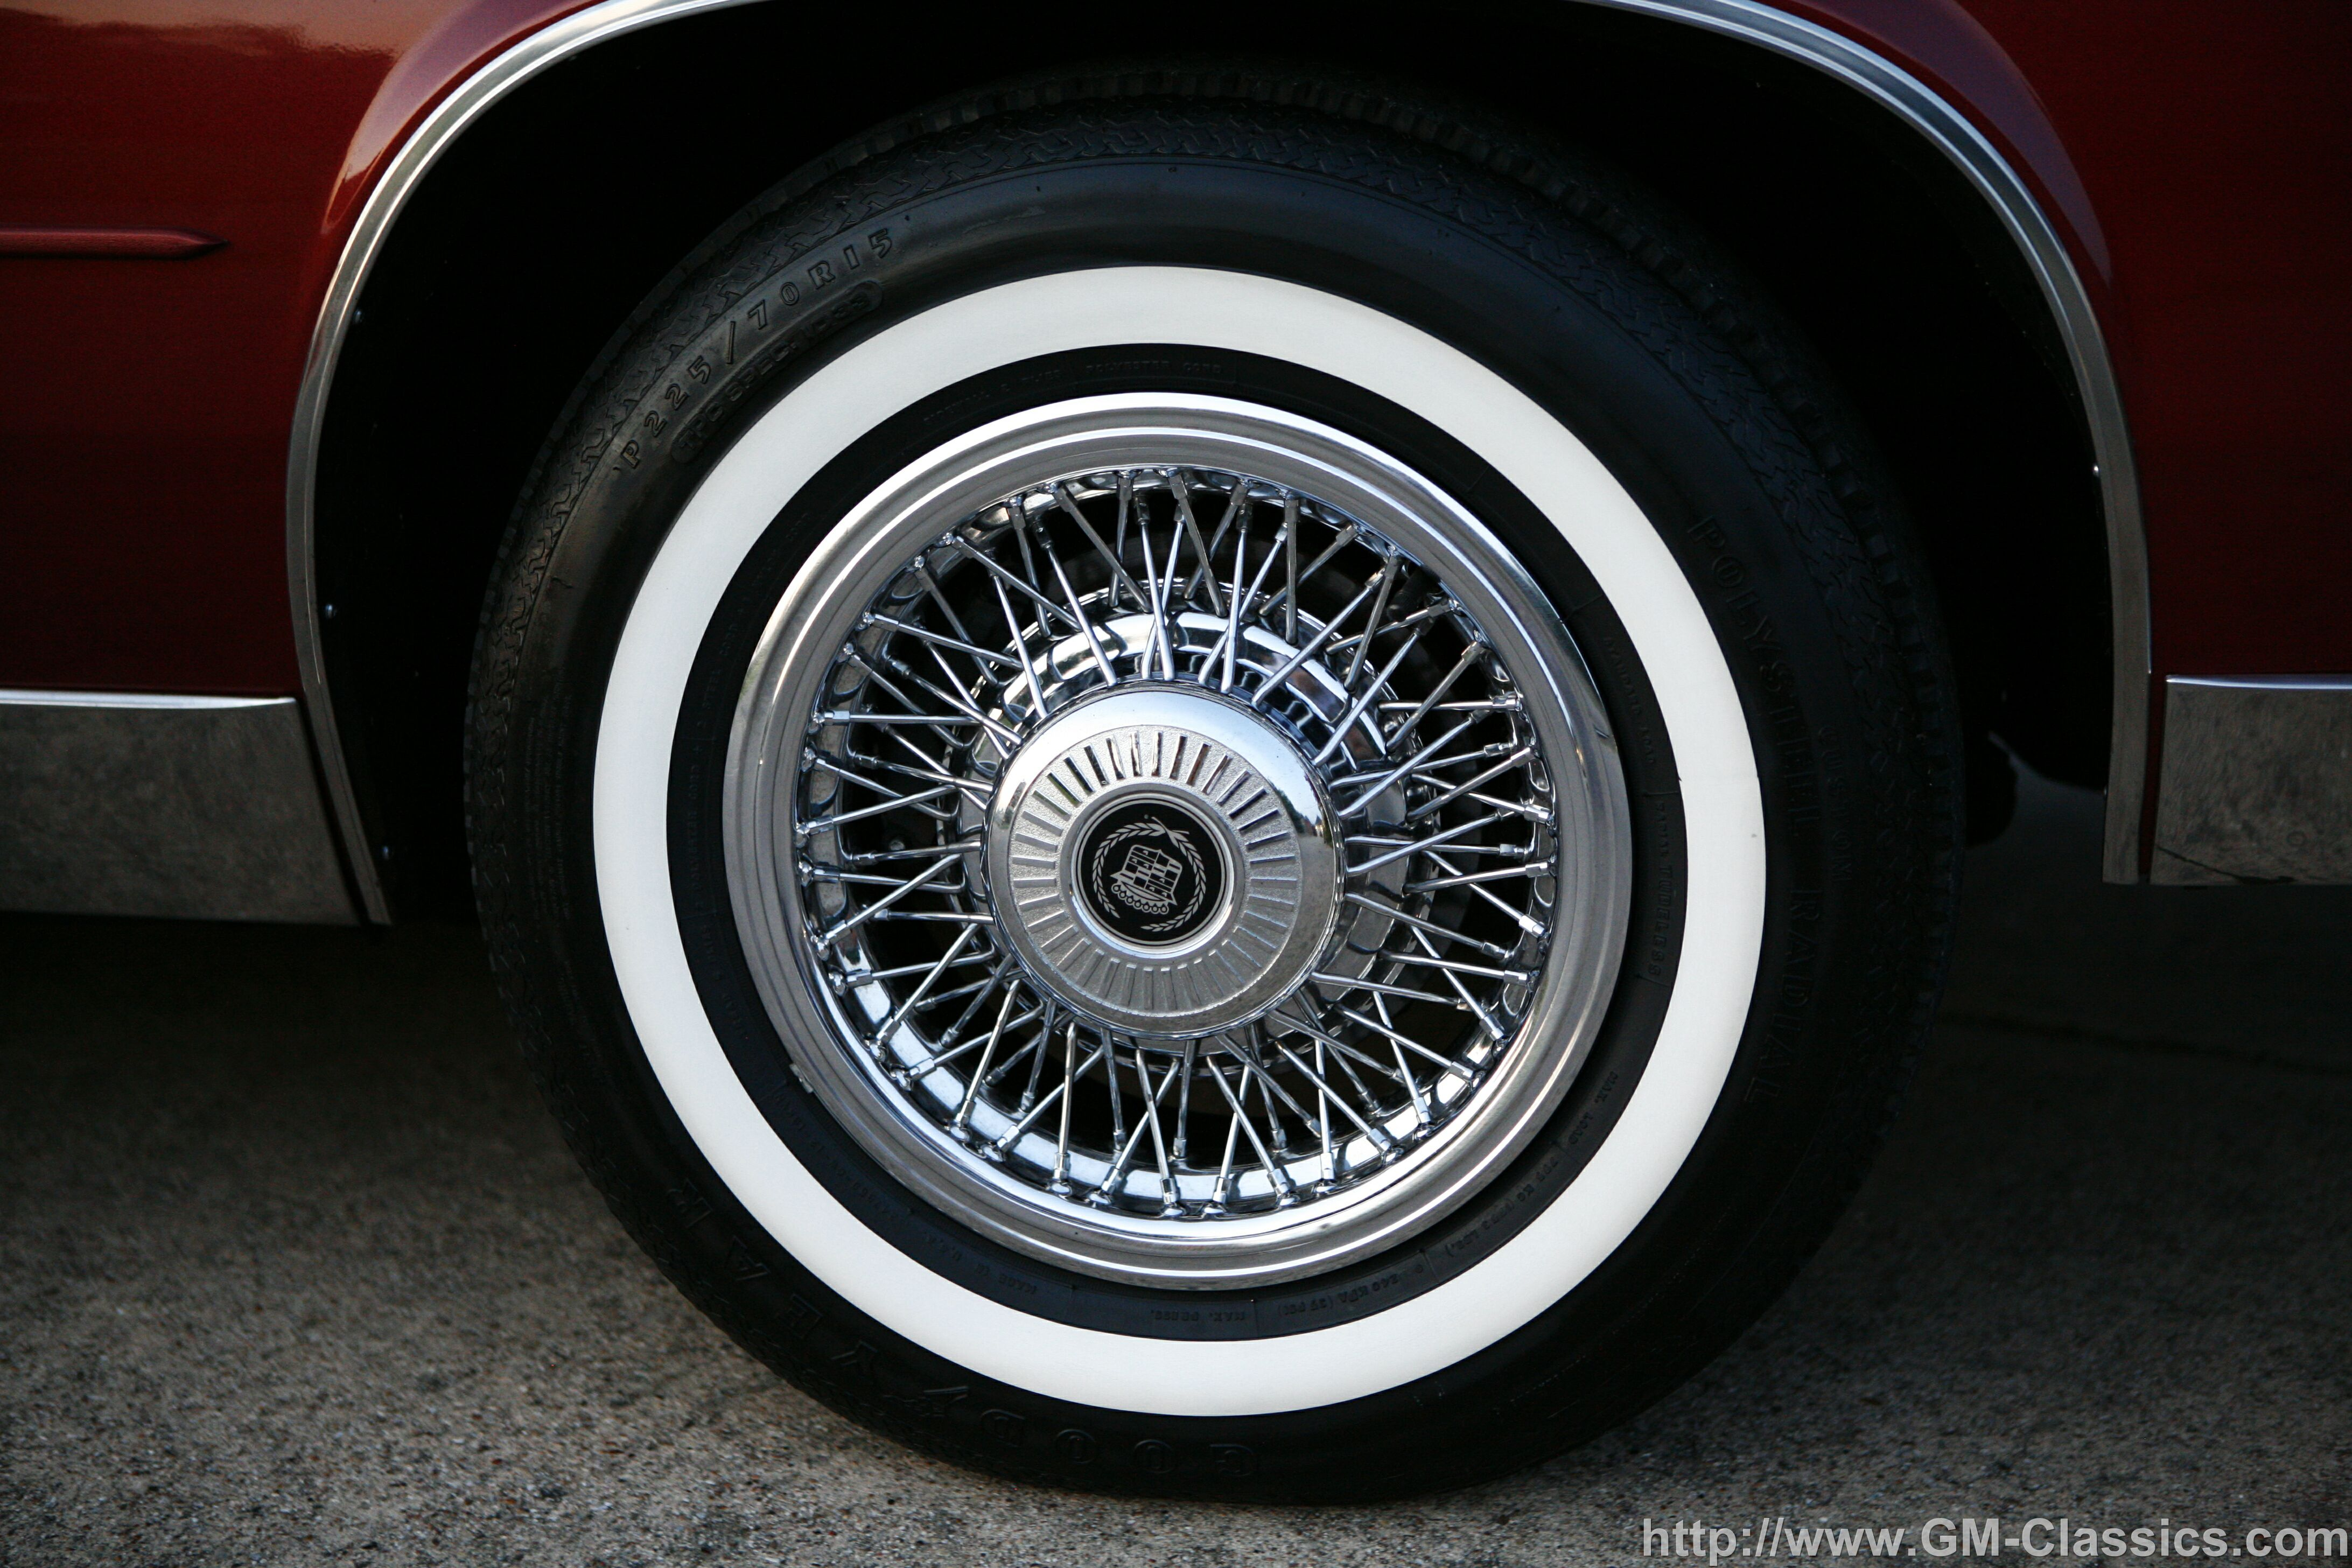 1985 Cadillac Eldorado Convertible - Matt Garrett